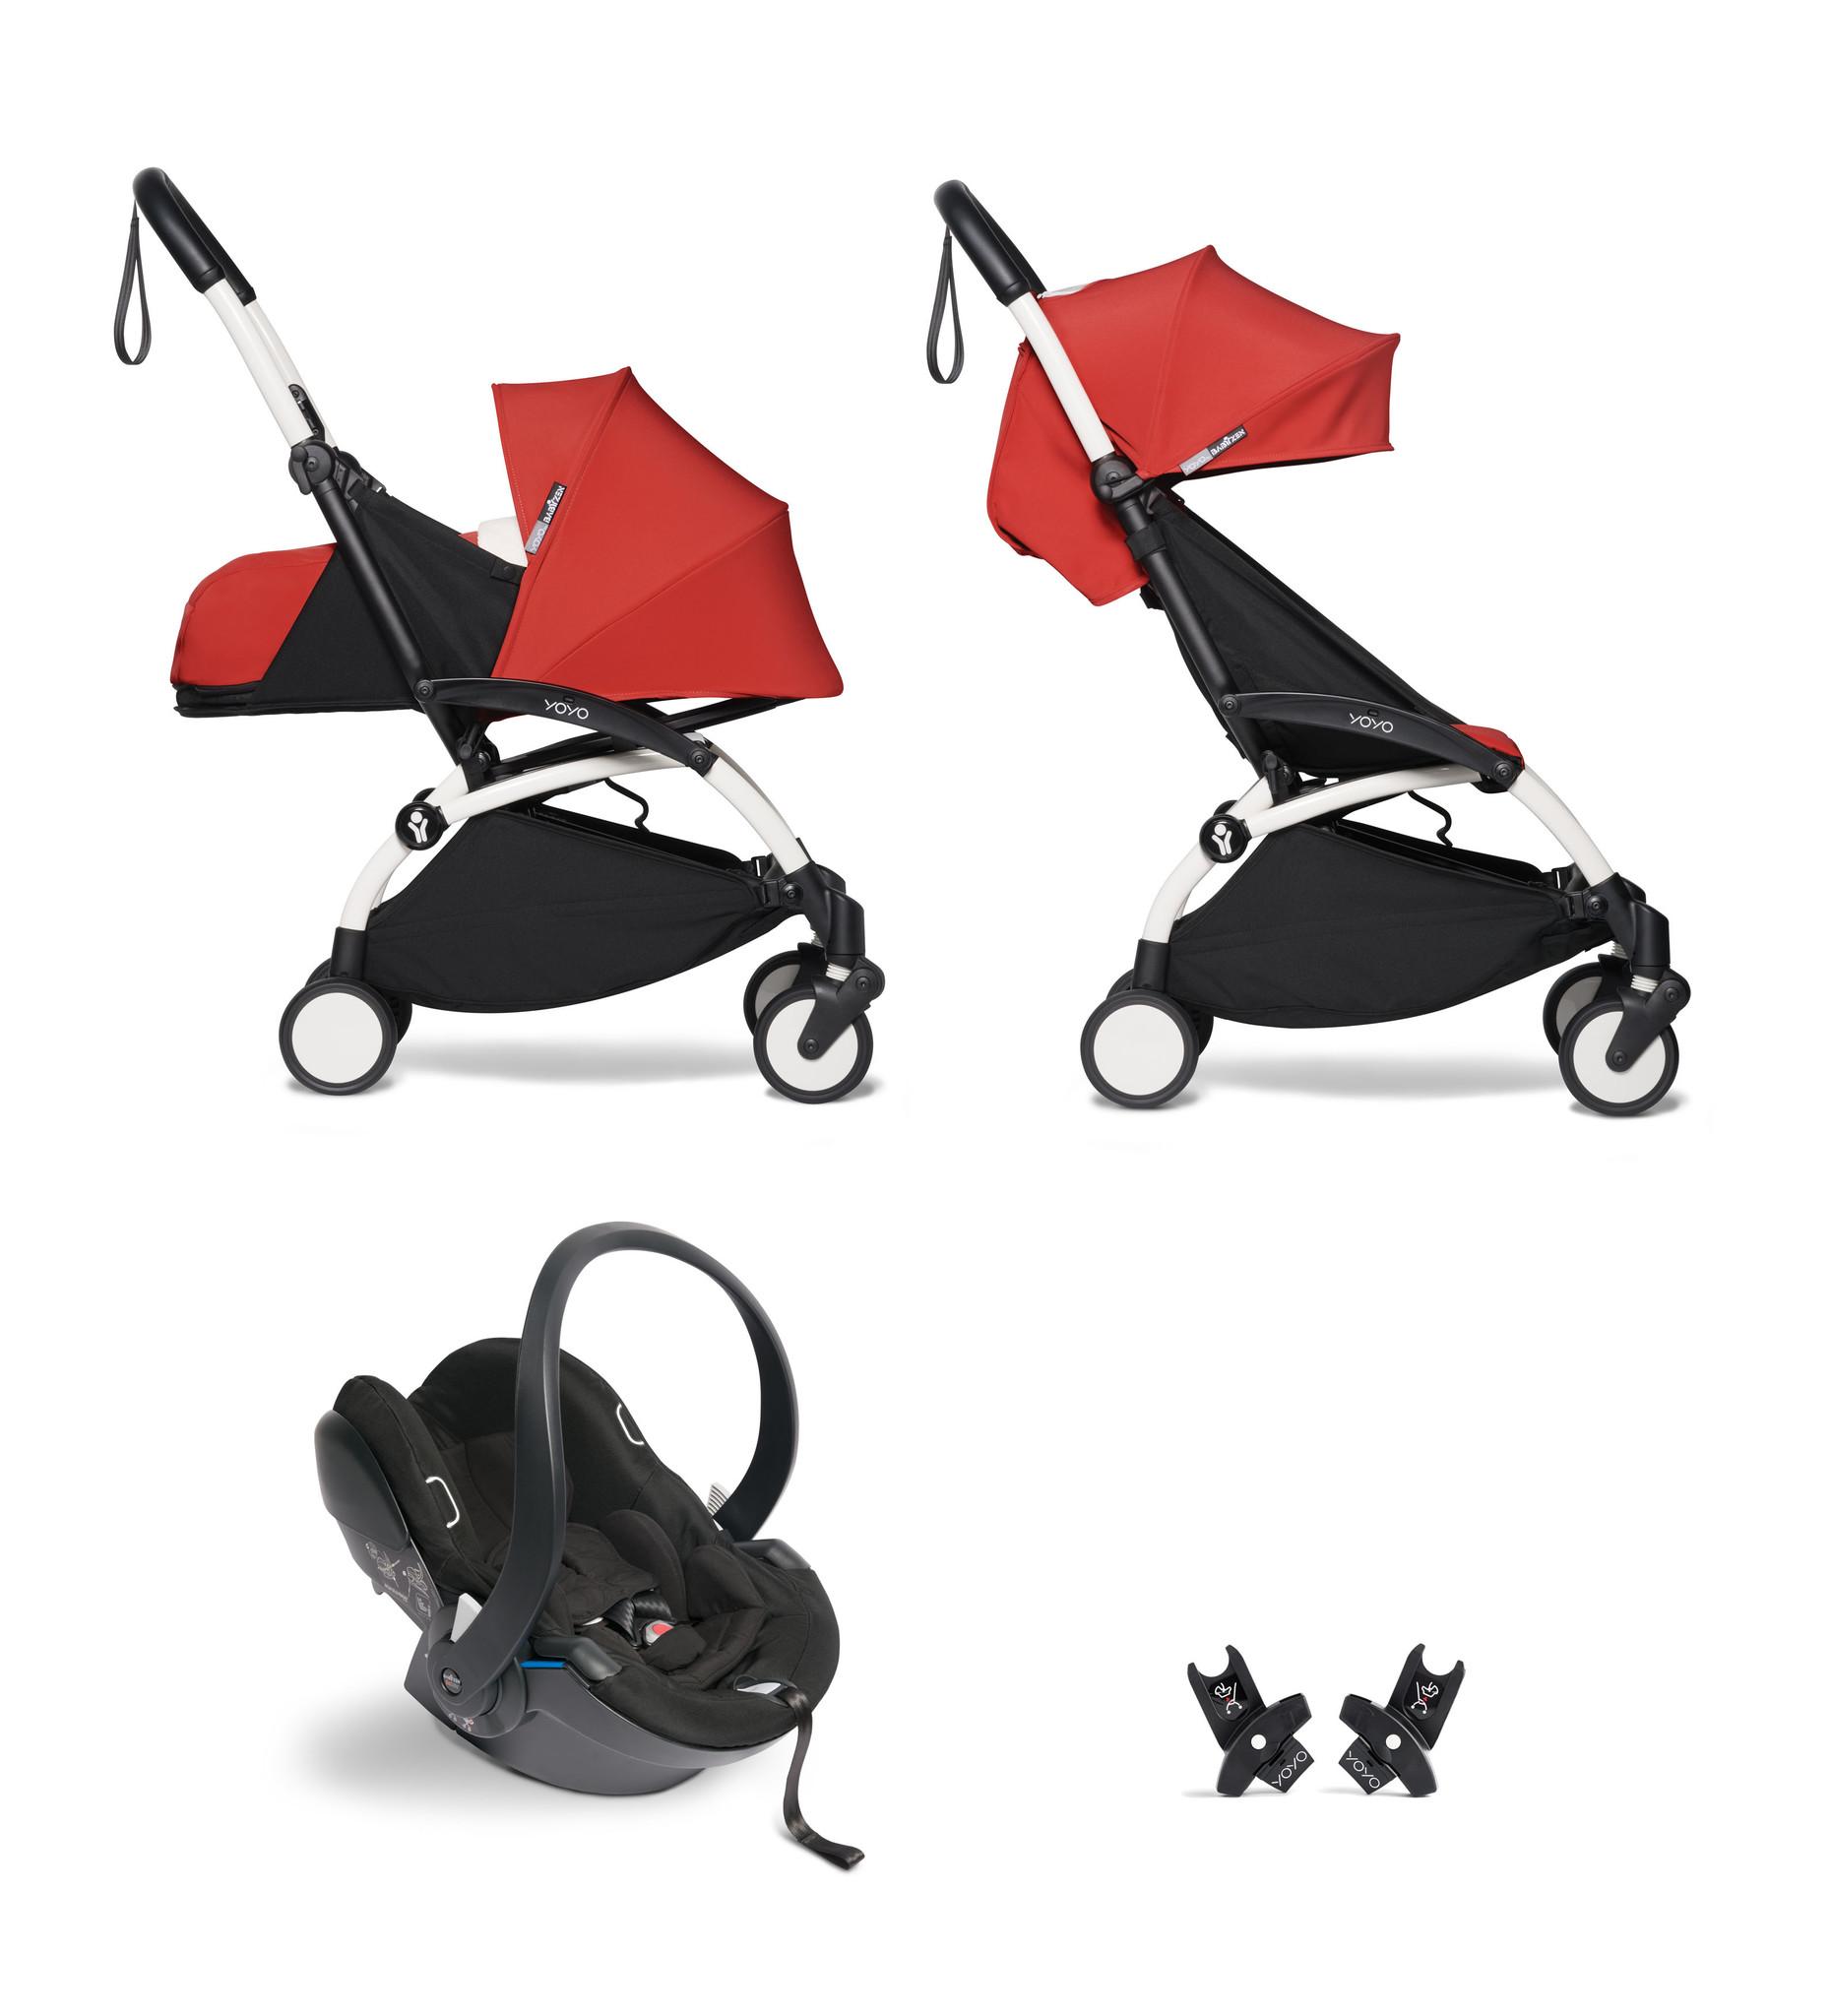 Babyzen YOYO² buggy COMPLEET / FULL SET 0+ and 6+ rood frame wit incl. YOYO² BeSafe autostoel zwart